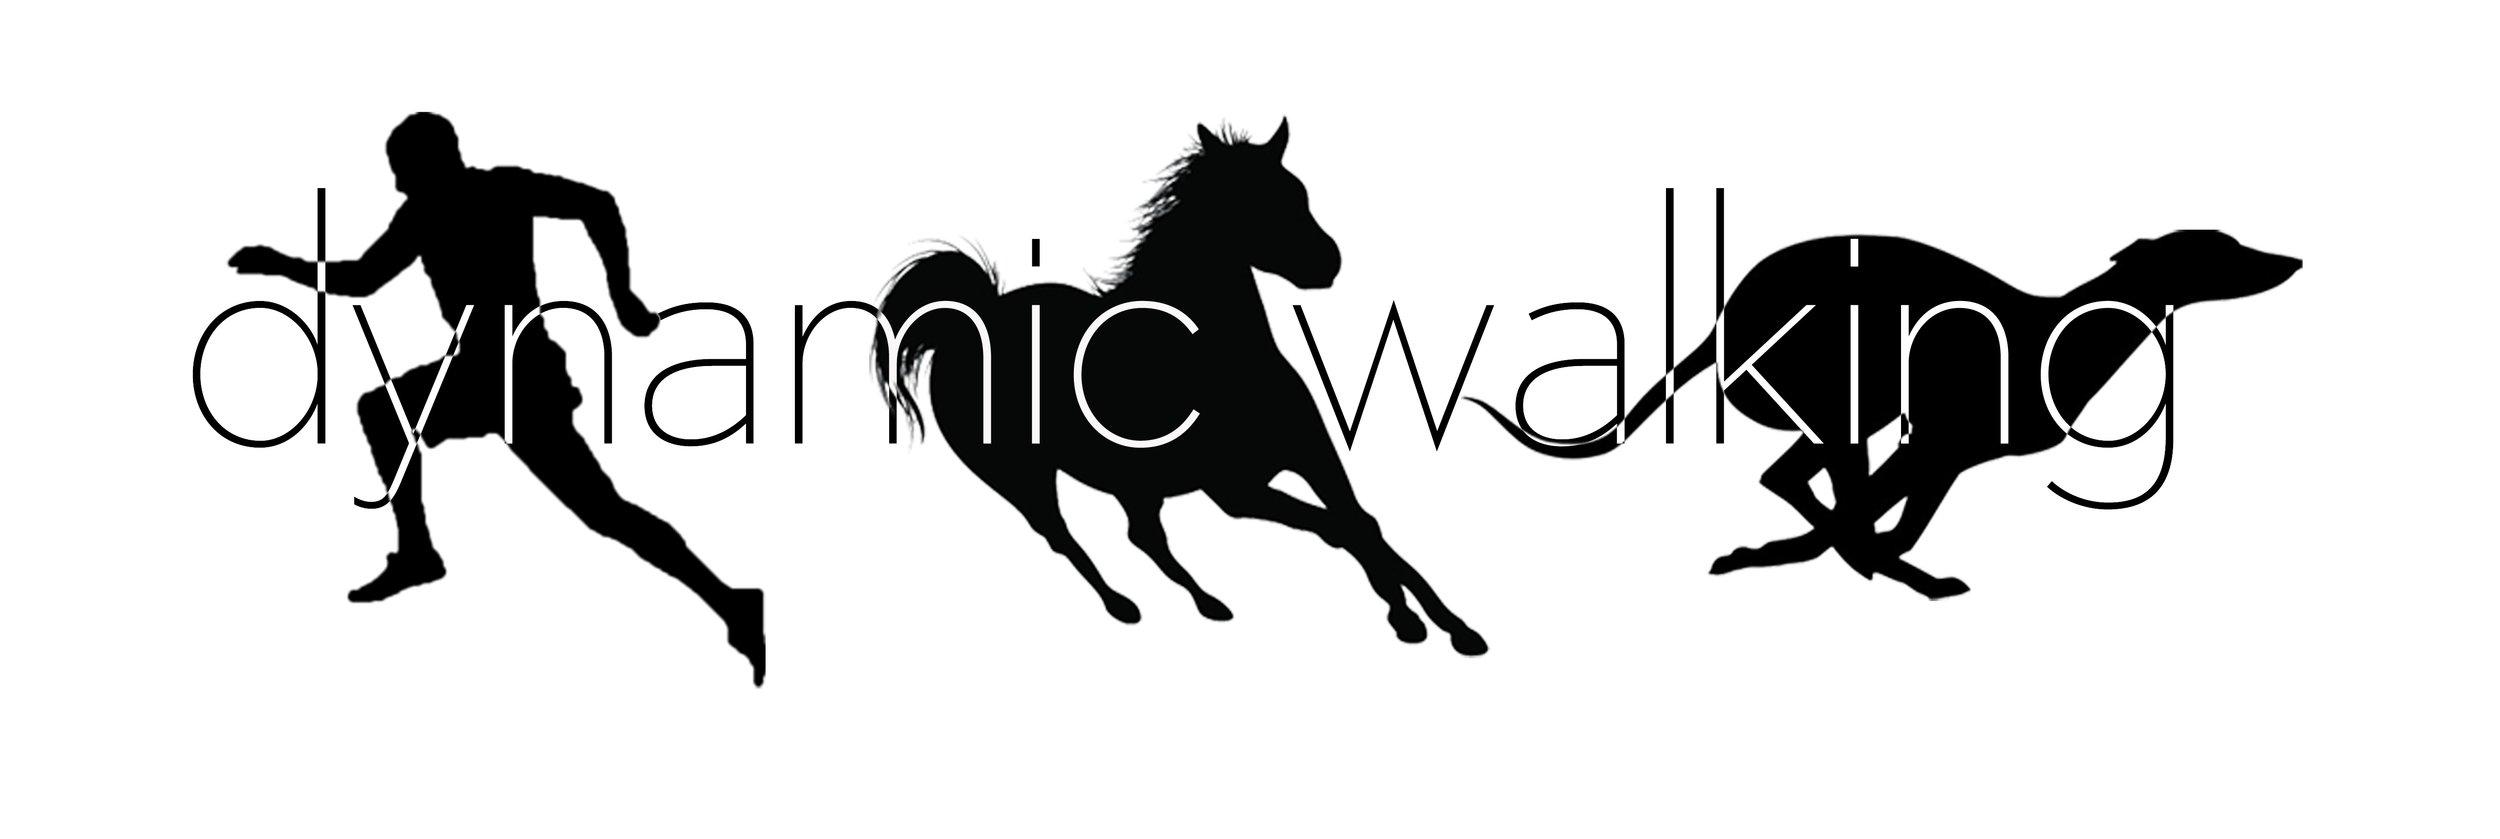 2012 Dynamic Walking Conference - May 21-24, 2012